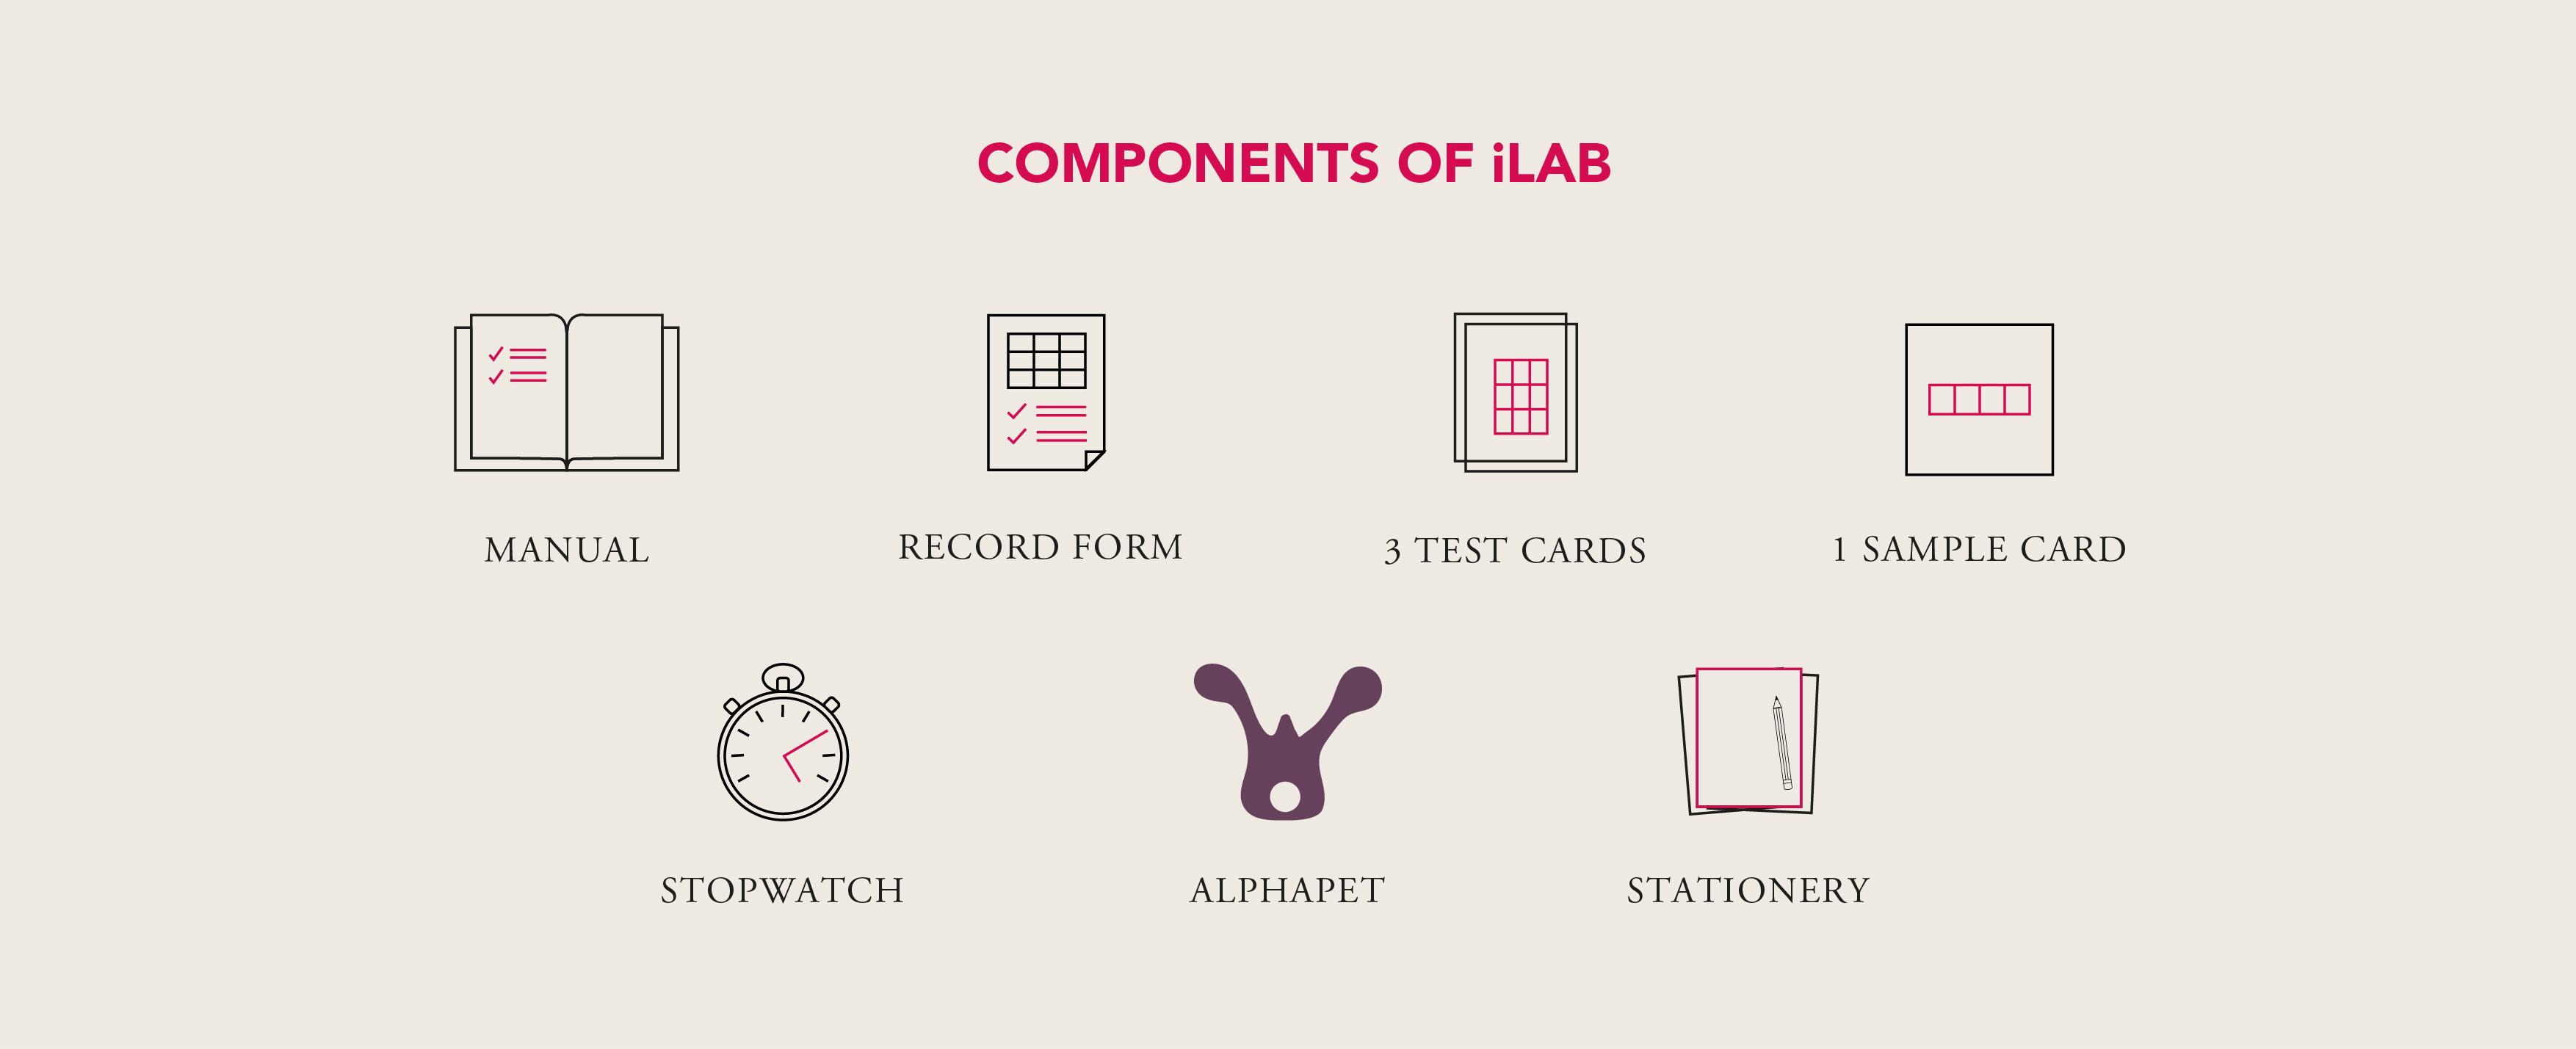 iLAB Components